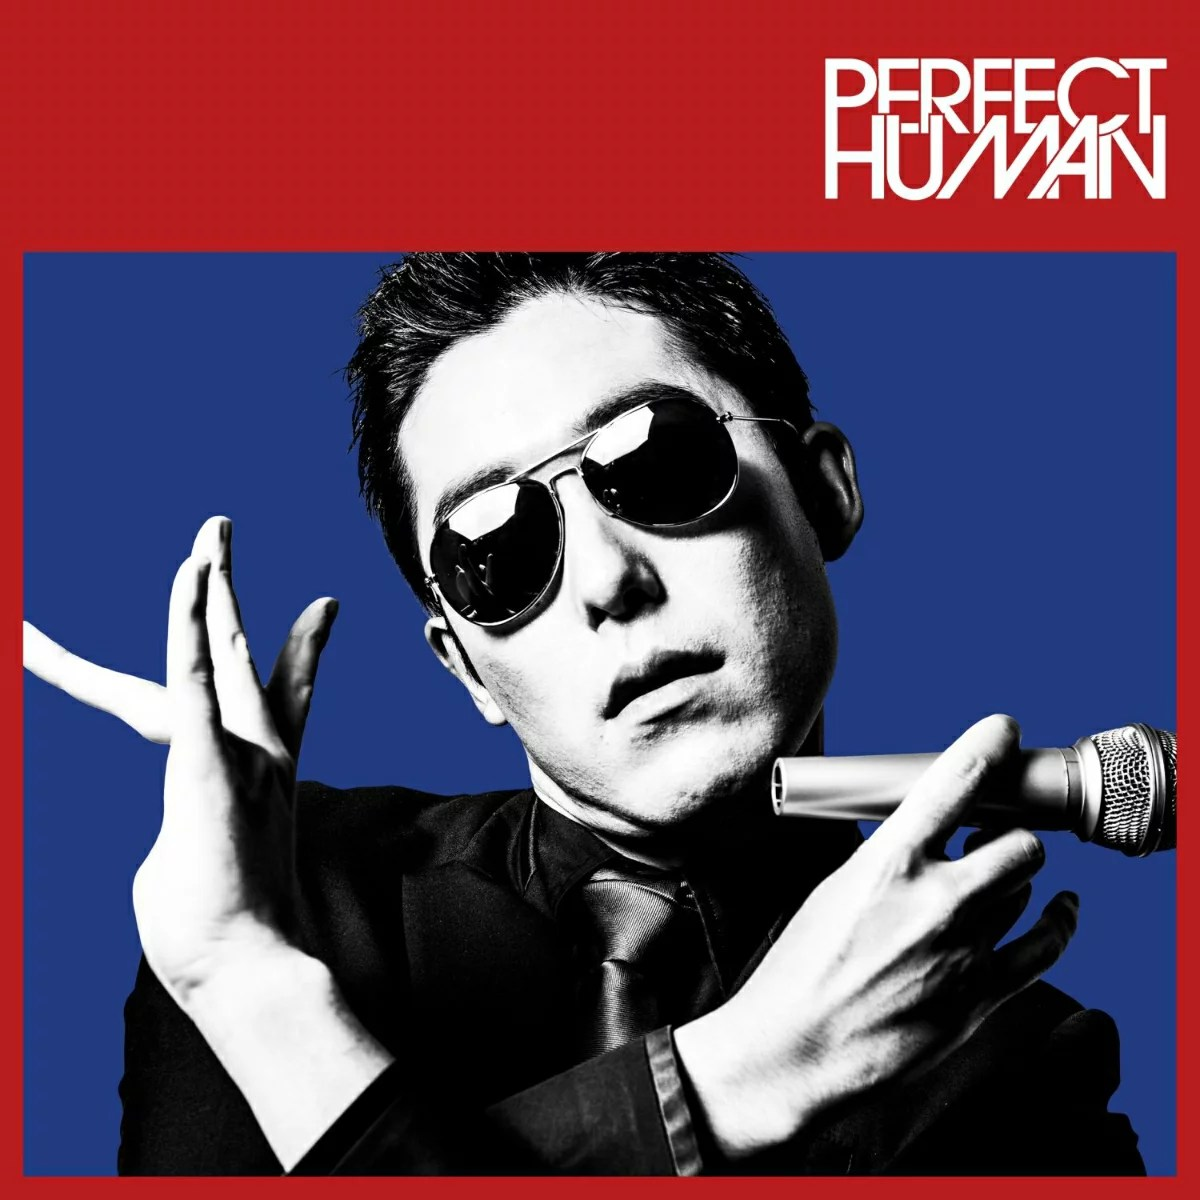 PERFECT HUMAN (通常盤TYPE-B) [ RADIO FISH ] - 楽天ブックス